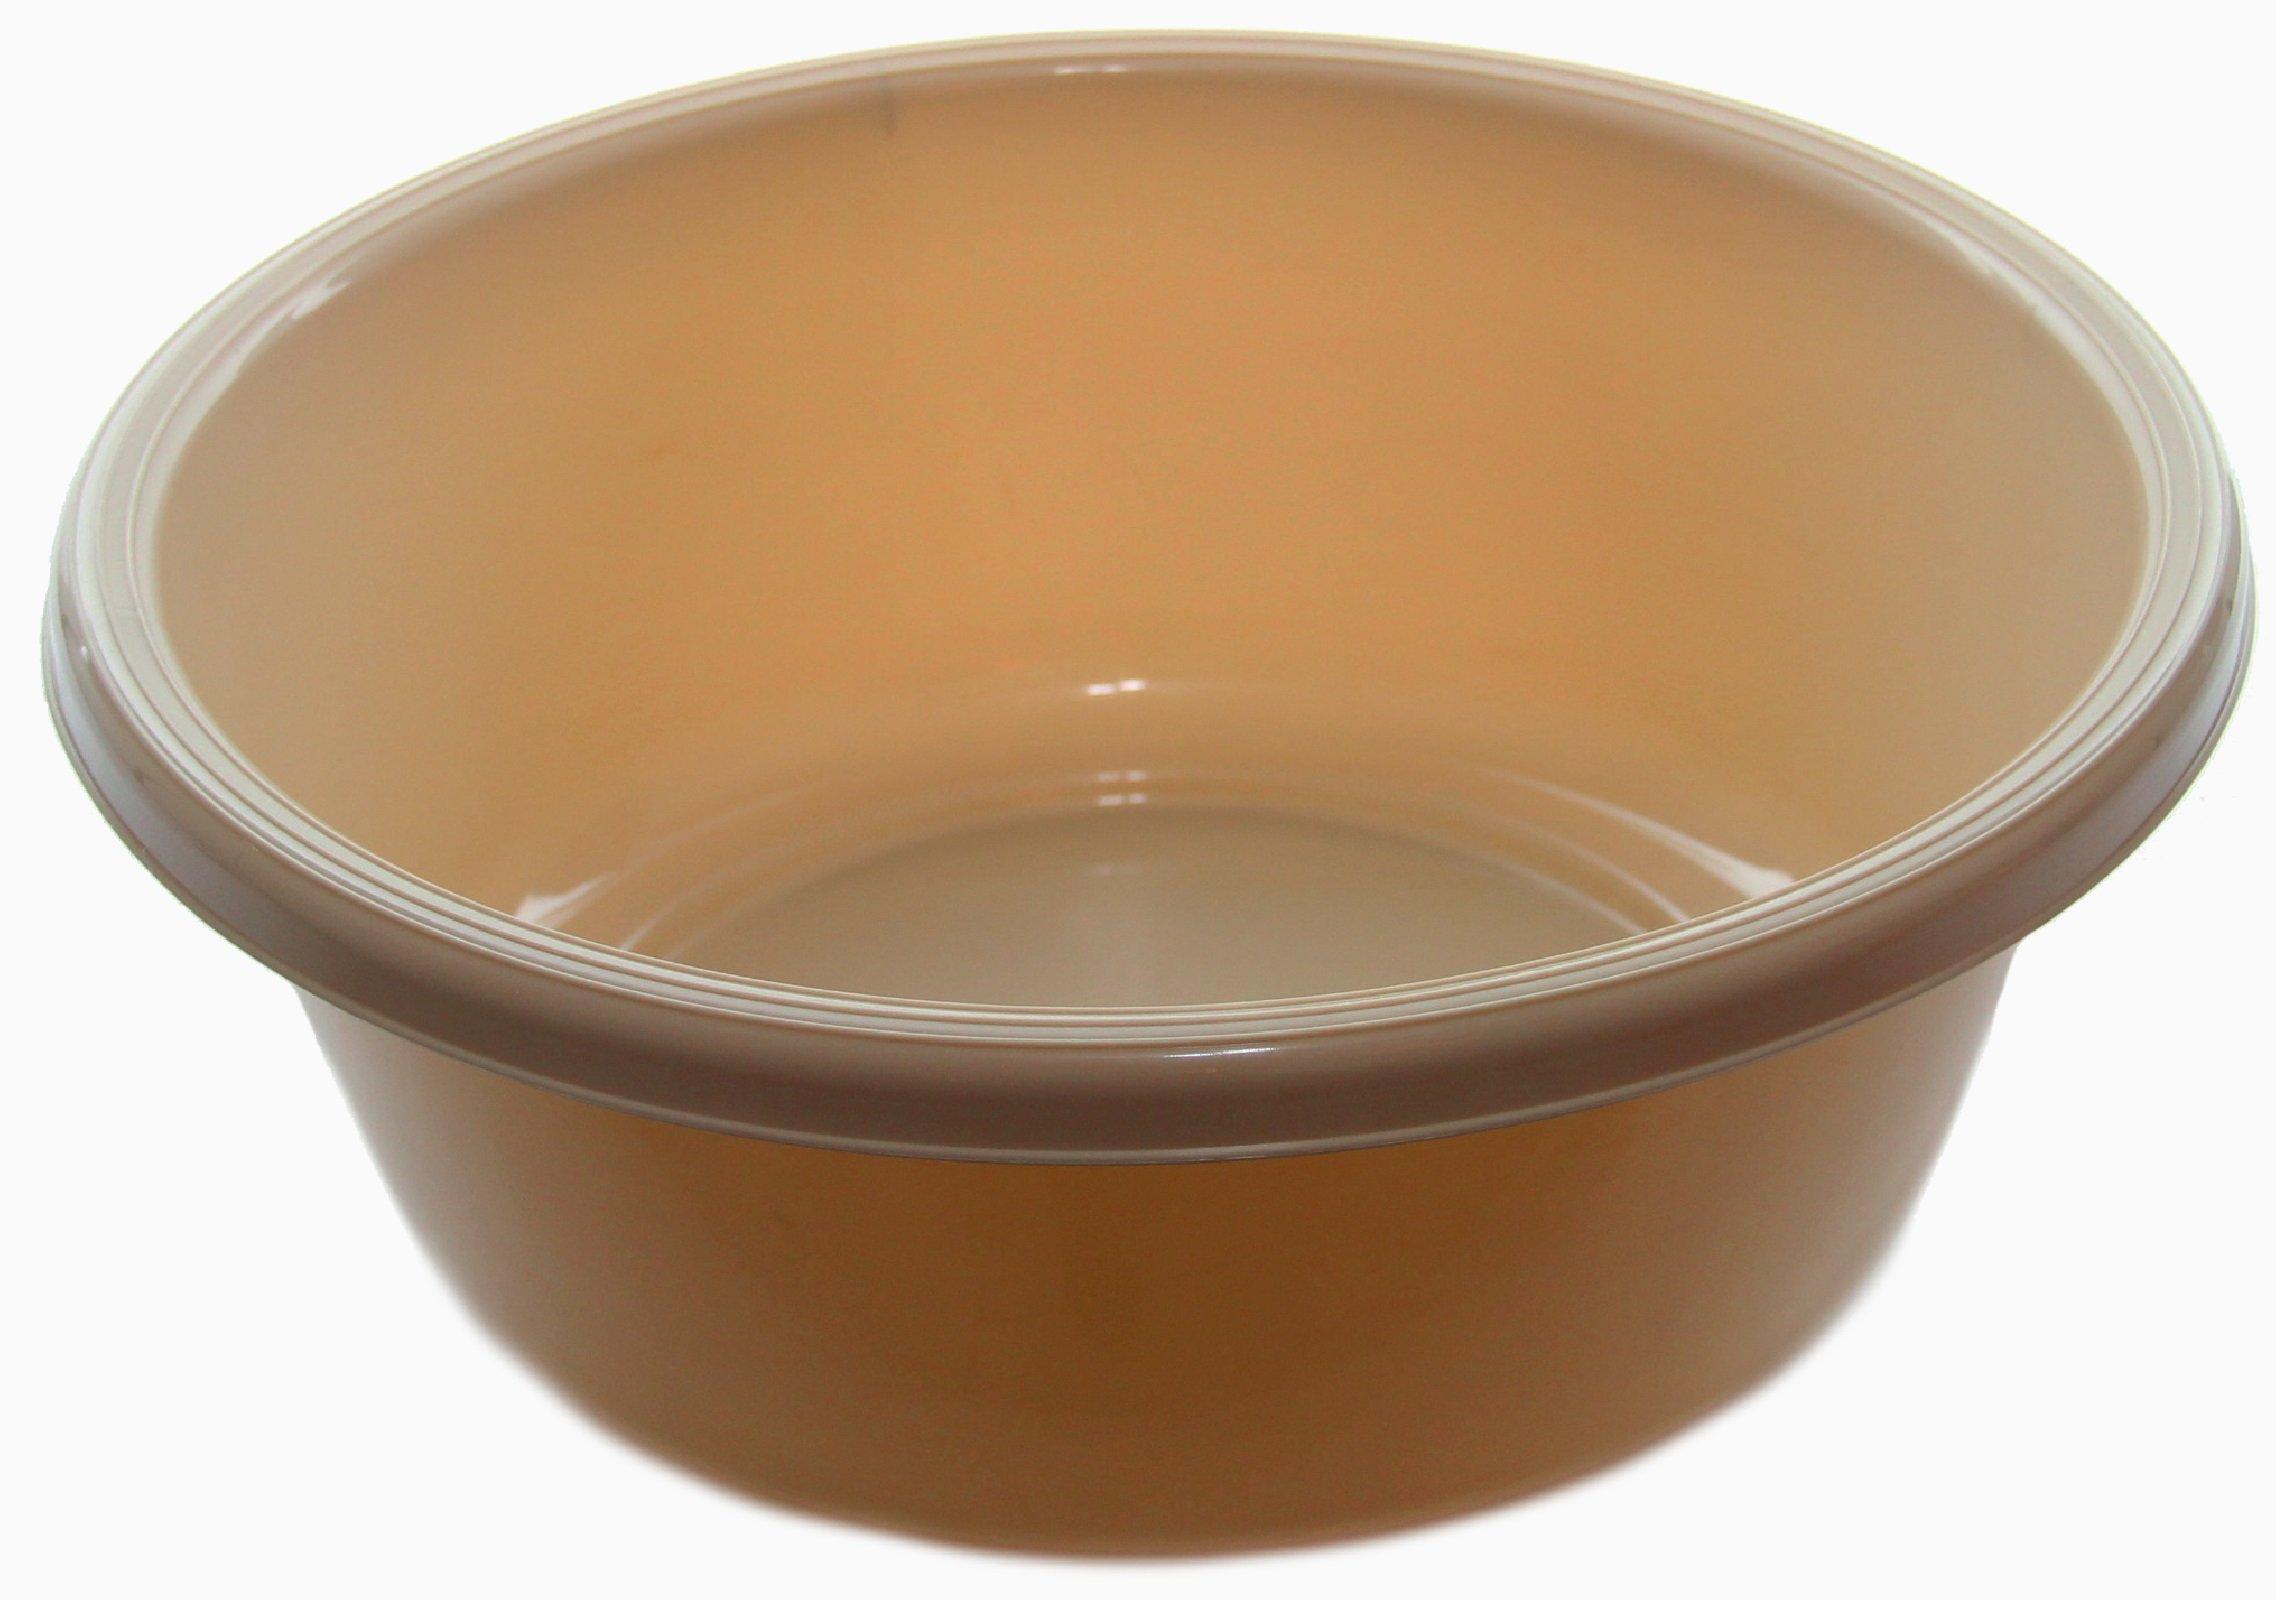 Ybm Home Round Plastic Wash Basin (1151 13 inch, Beige)